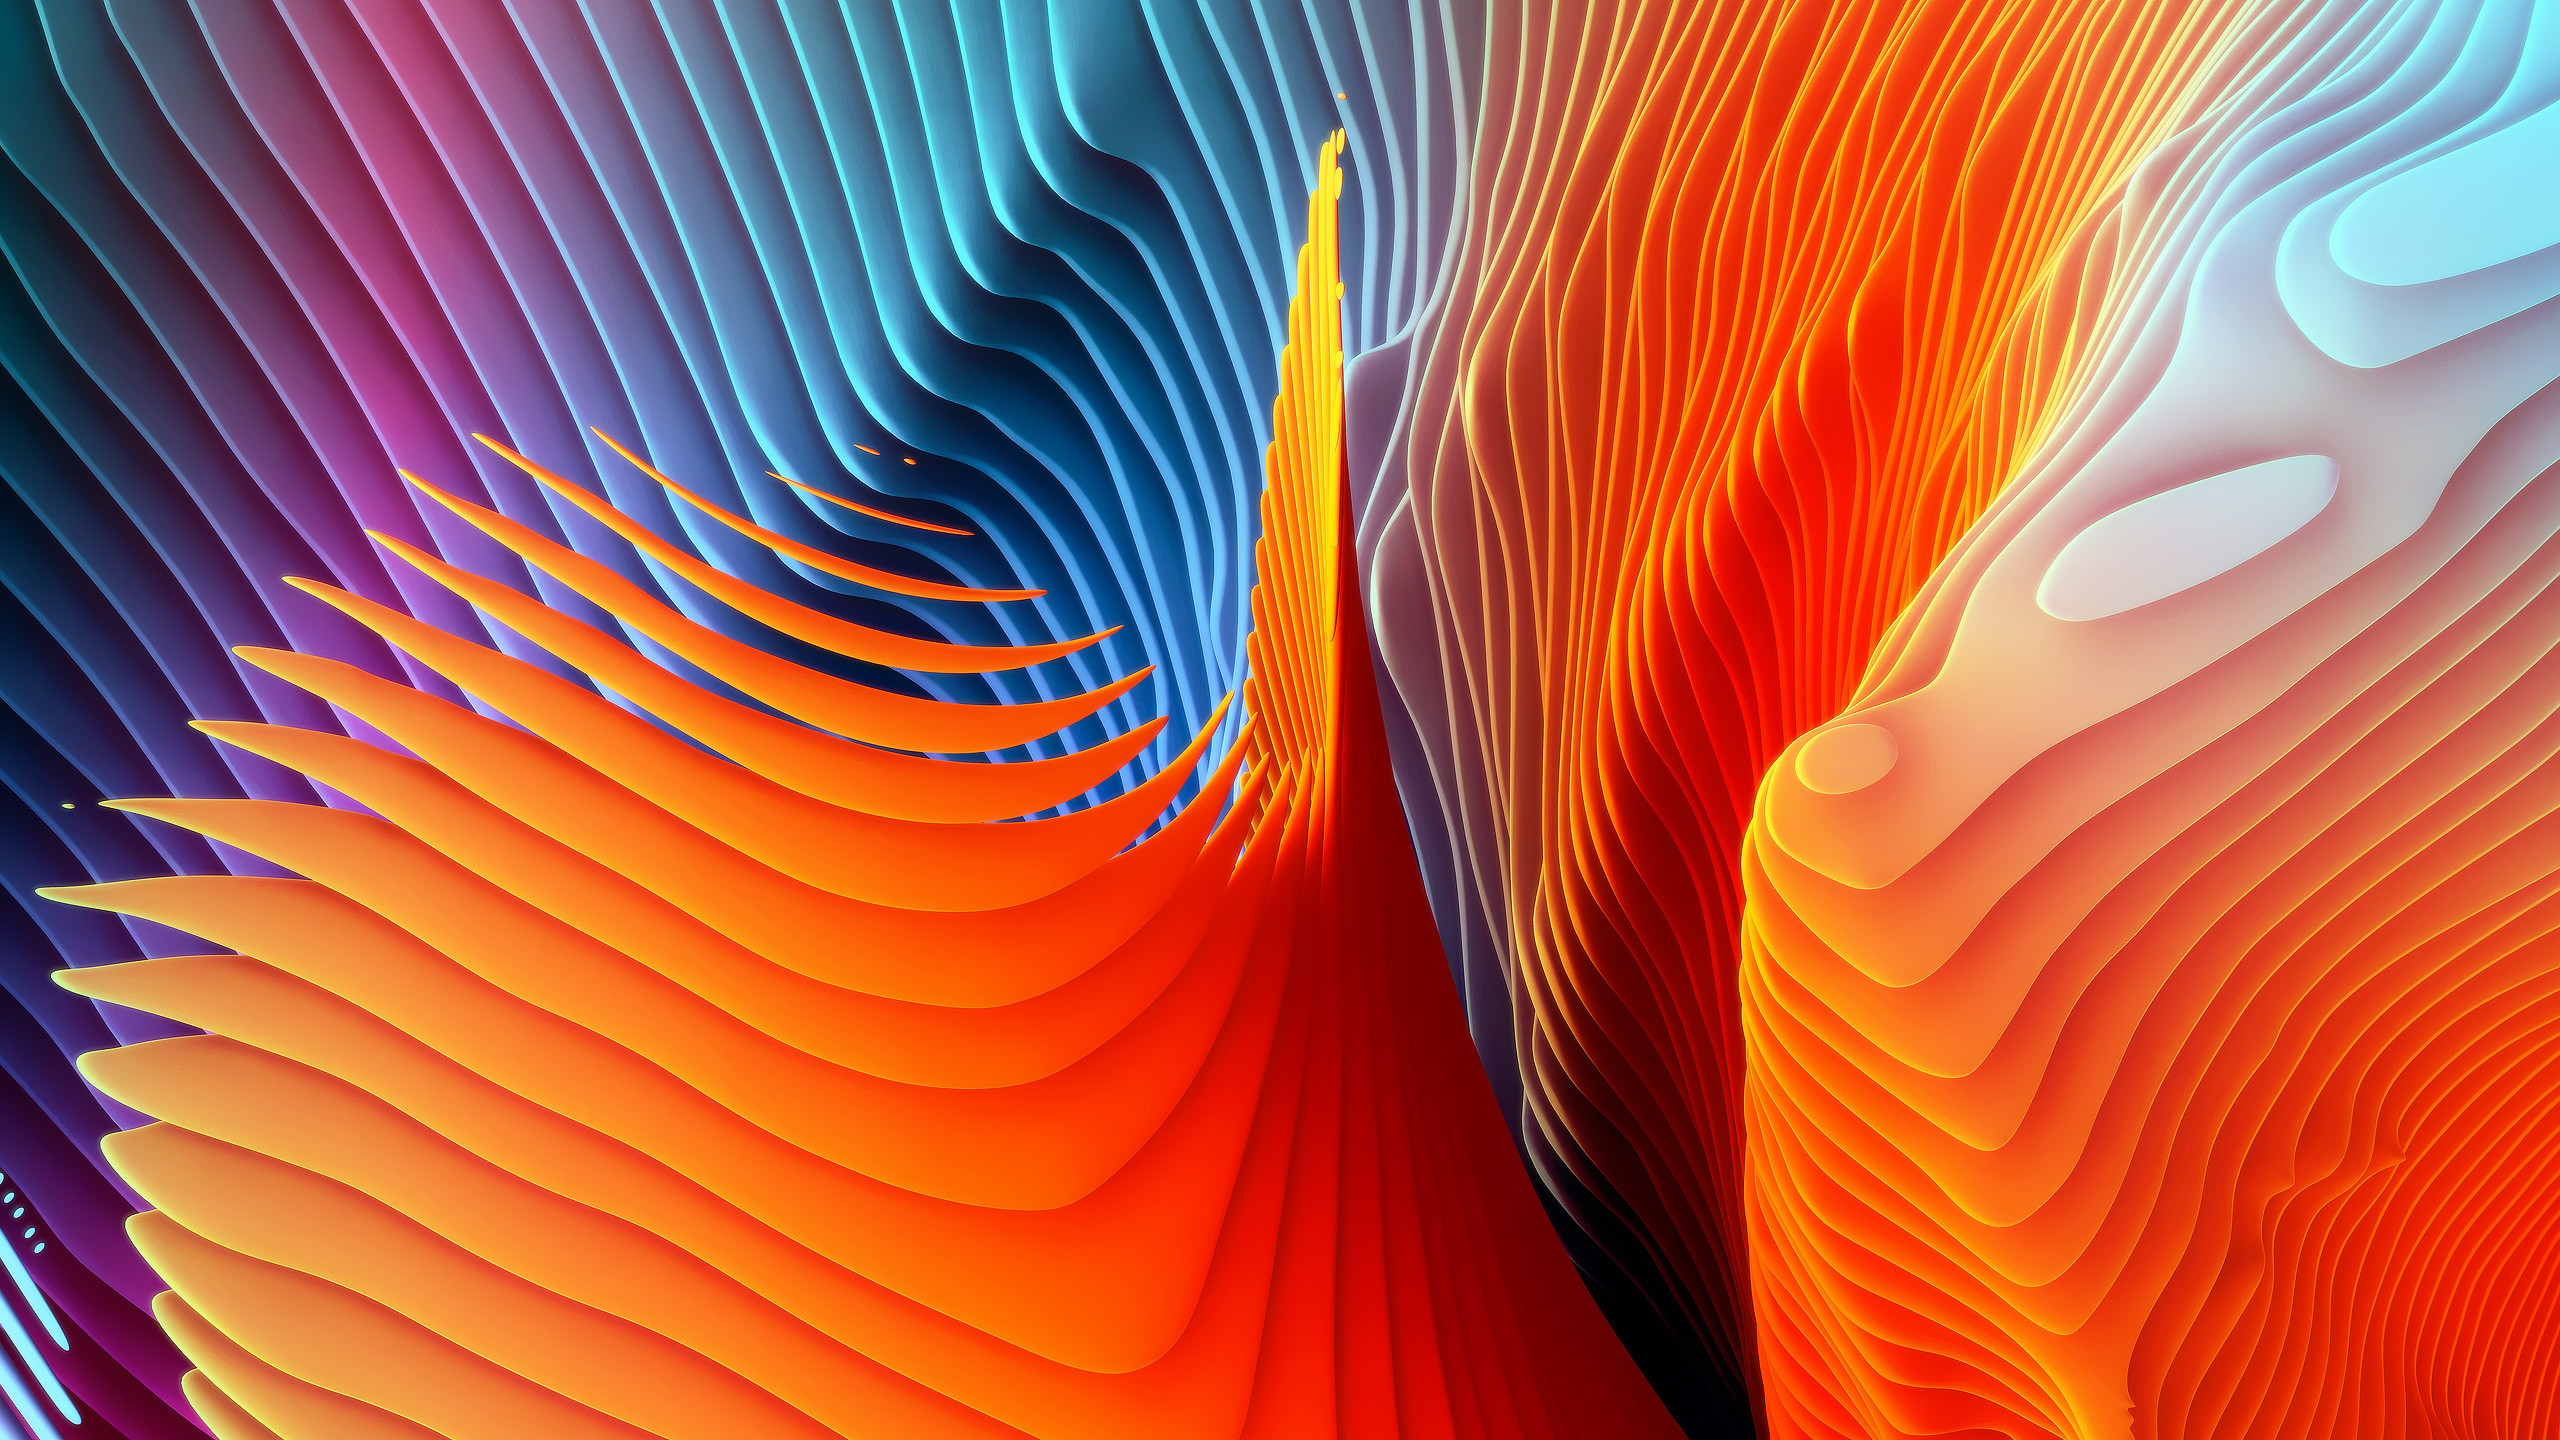 Abstract / Orange Wallpaper